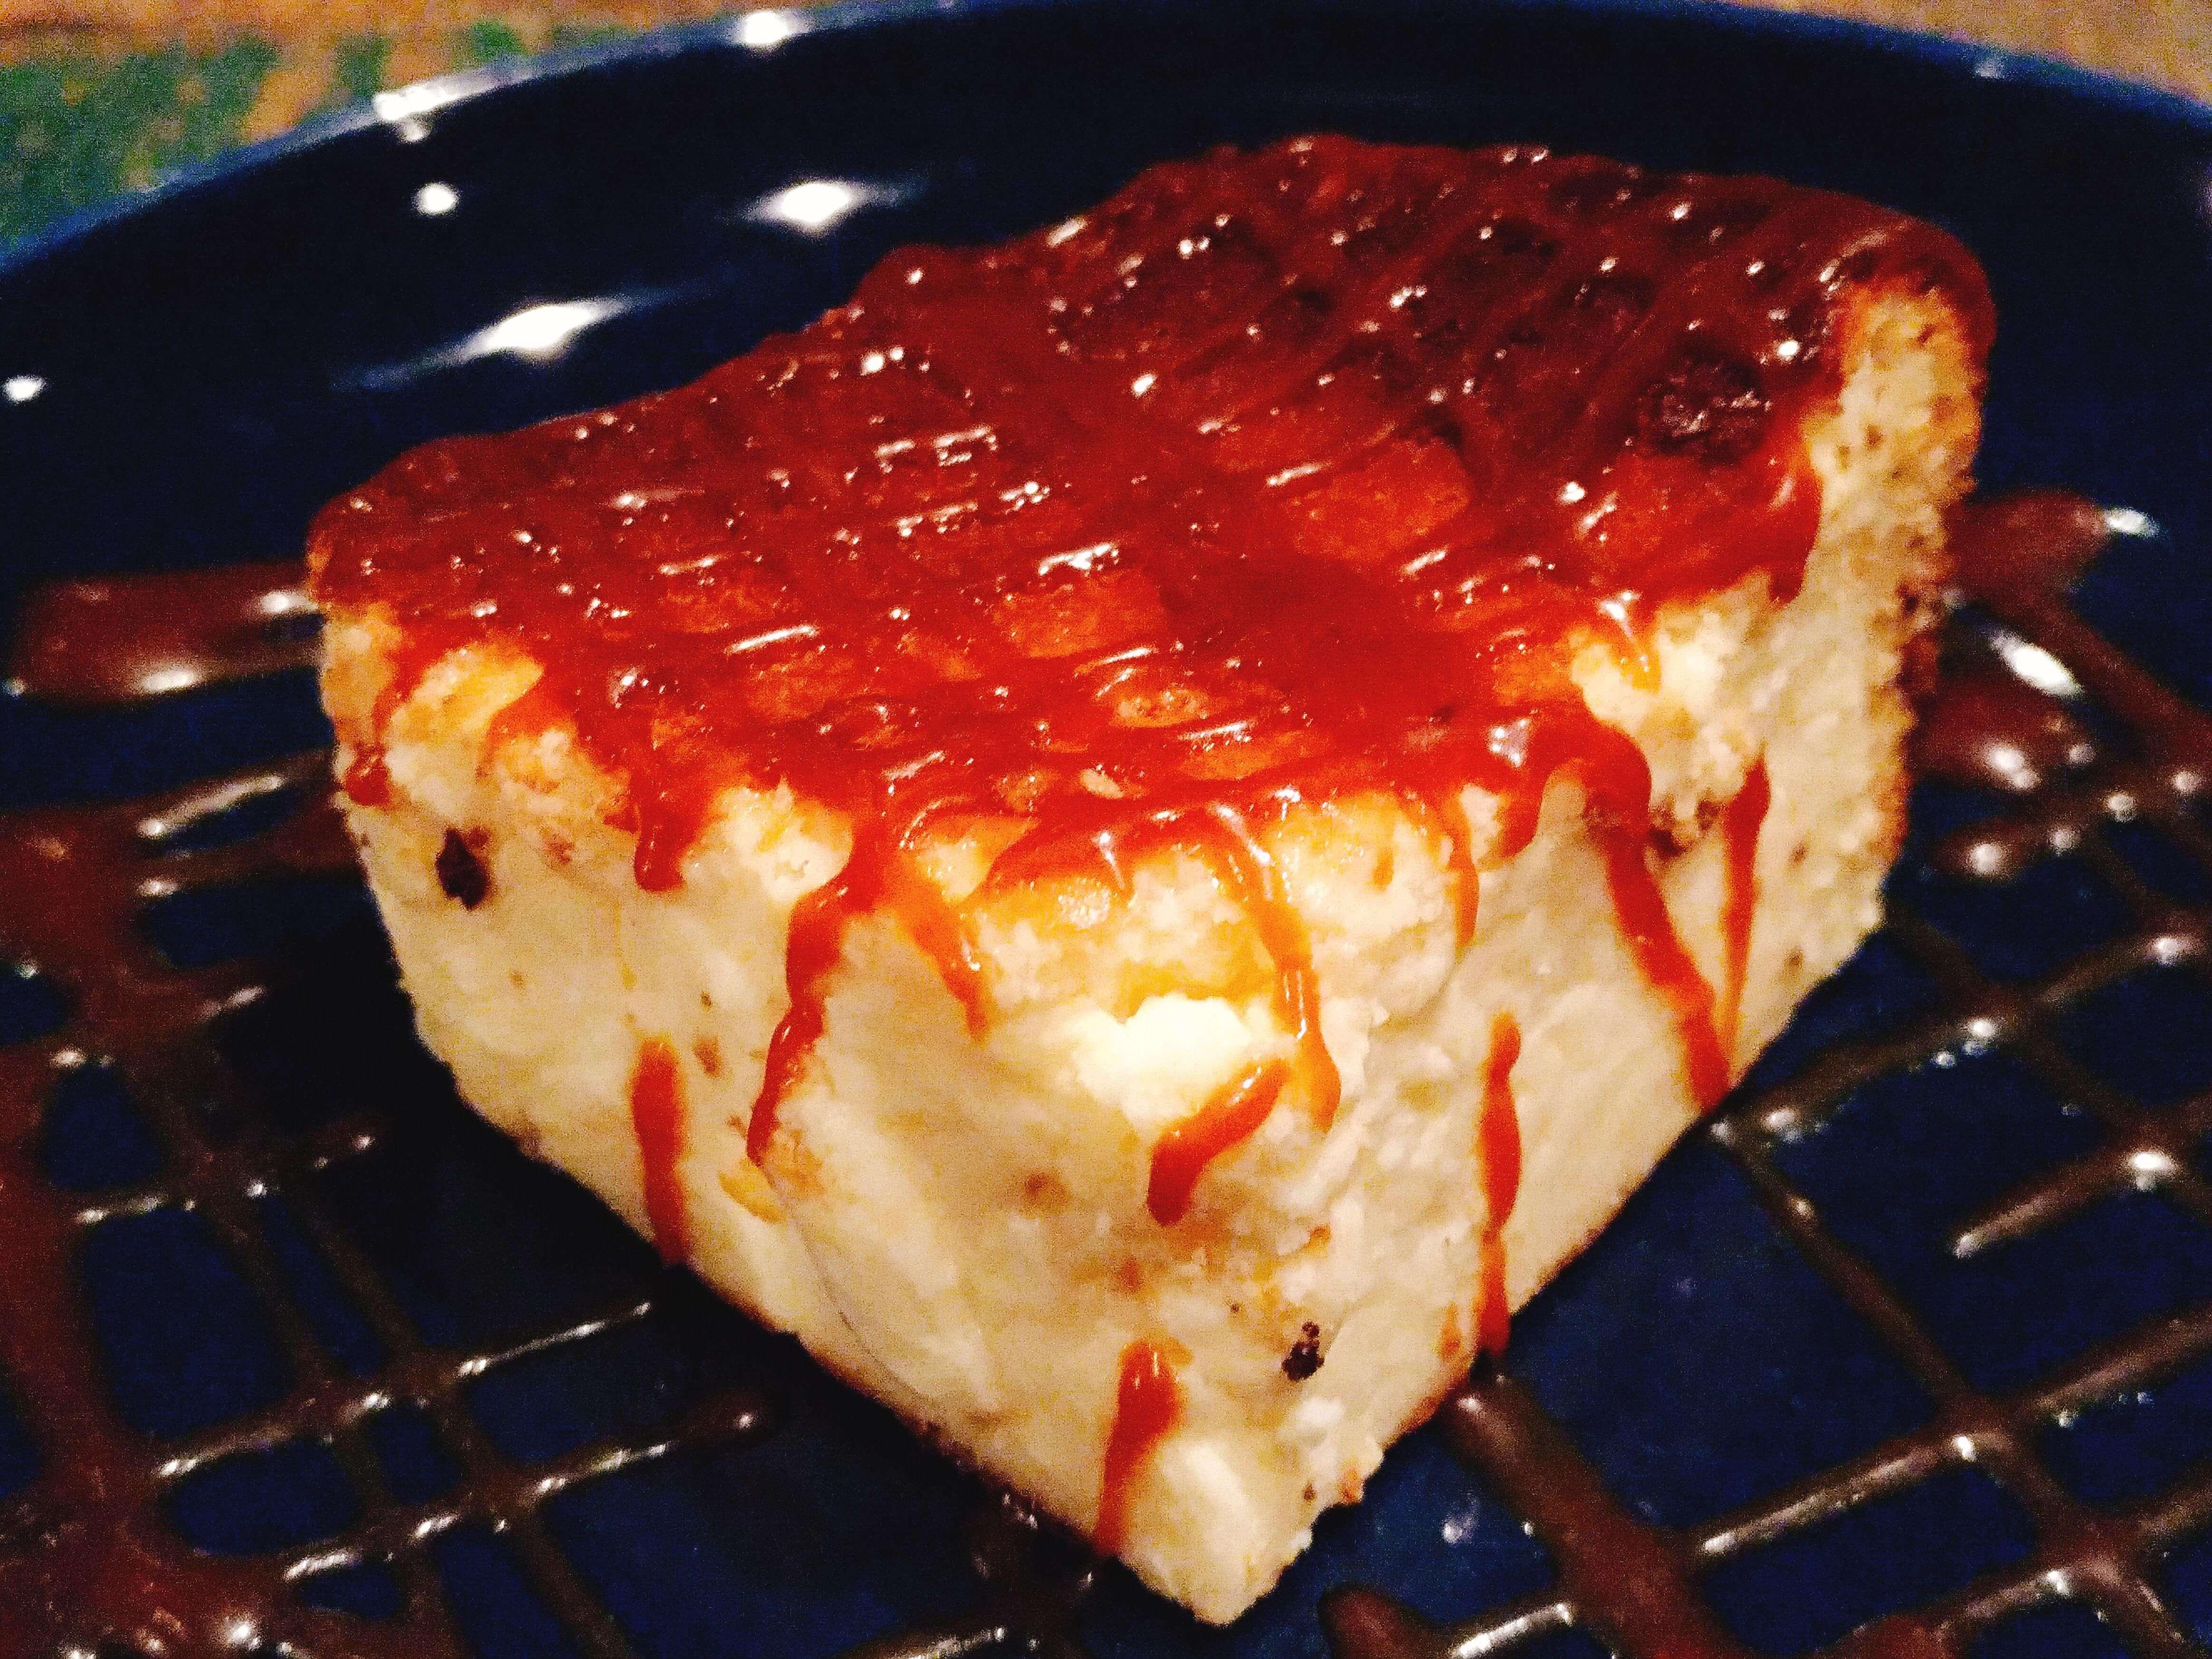 suzu cafe(渋谷) 焦がしキャラメルの濃厚チーズケーキ (3)